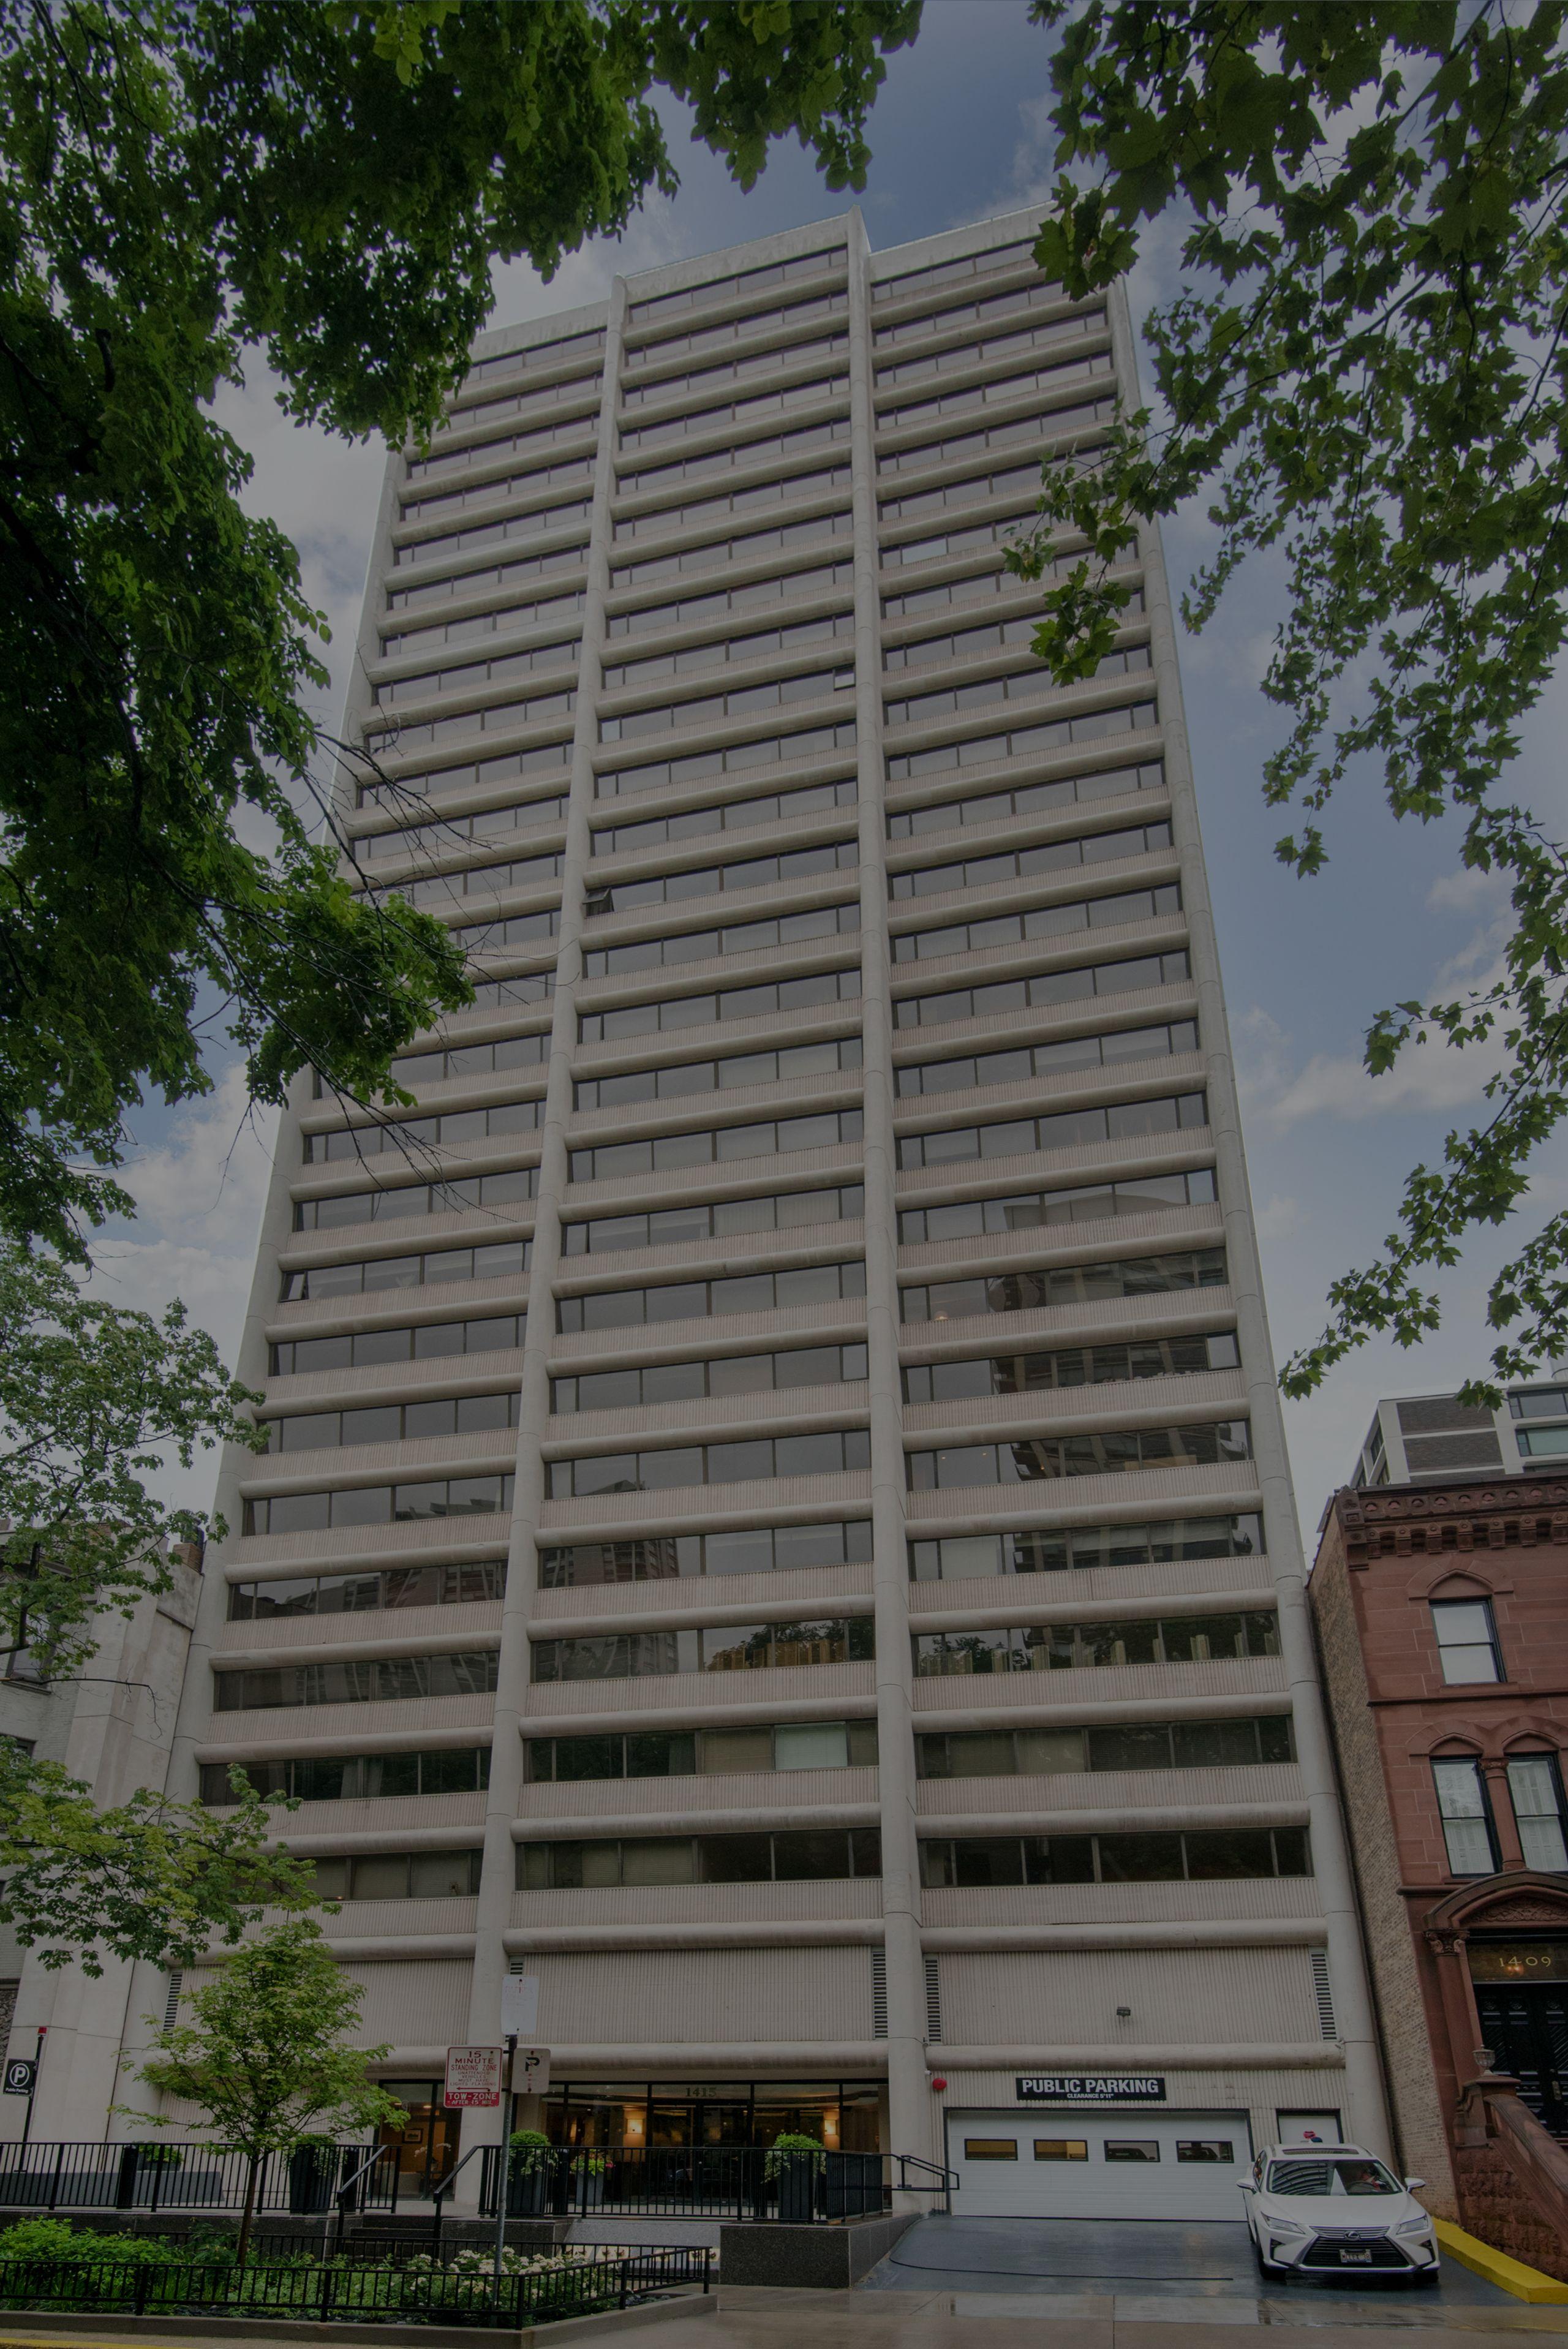 Just Sold: 1415 N Dearborn St Unit 21D, Chicago, IL 60610